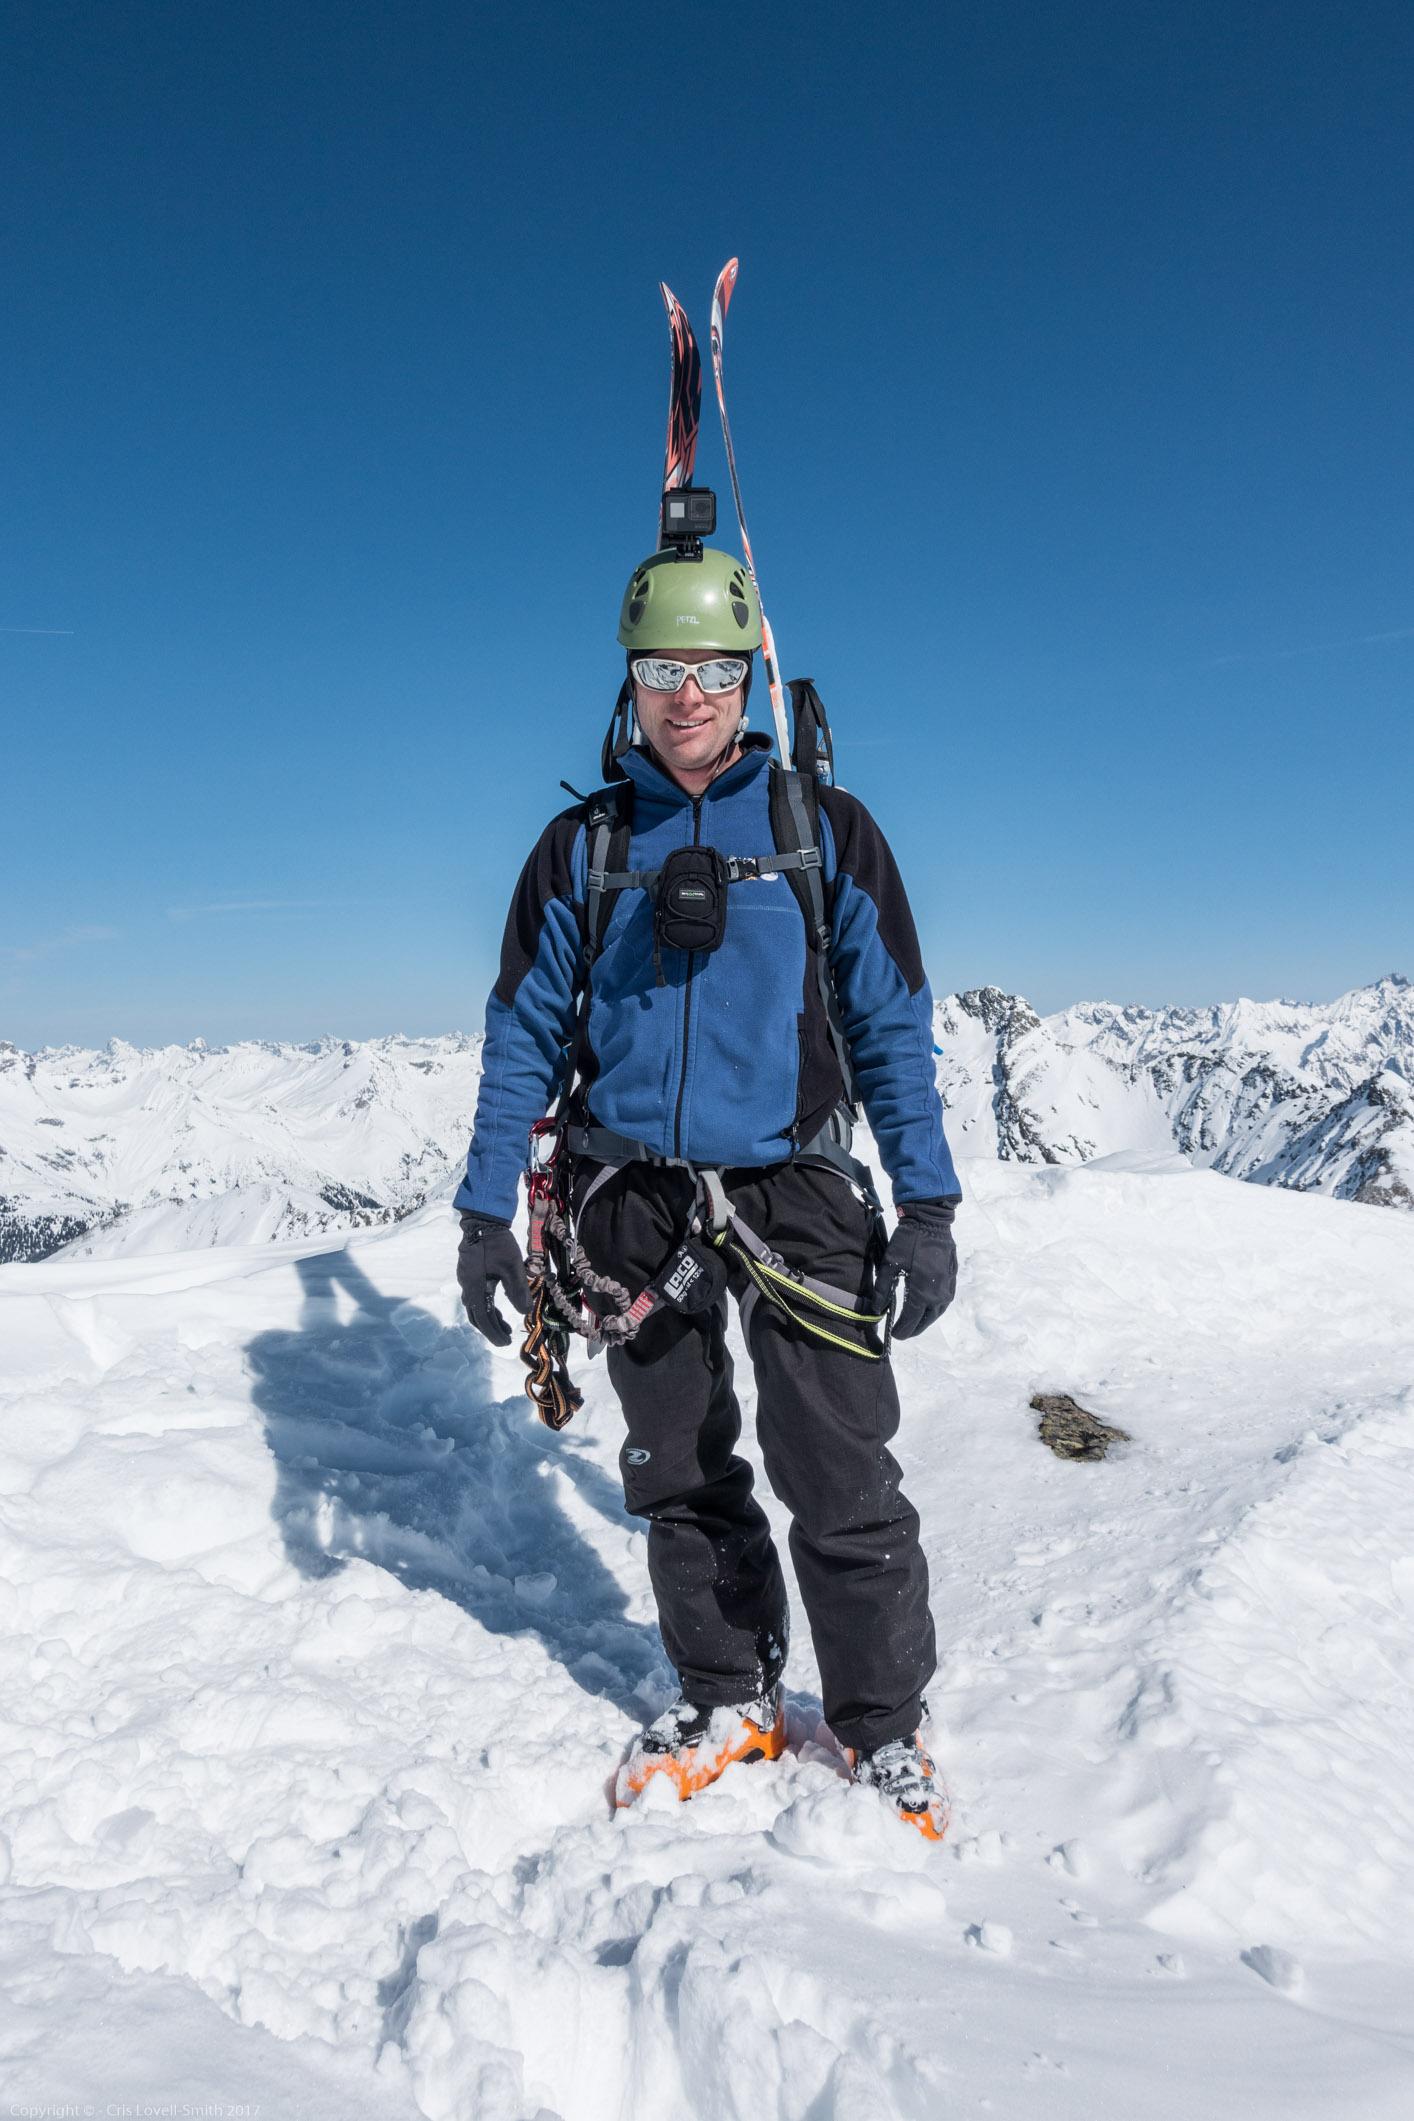 Cris posing (Arlberger Winterklettersteig March 2017)